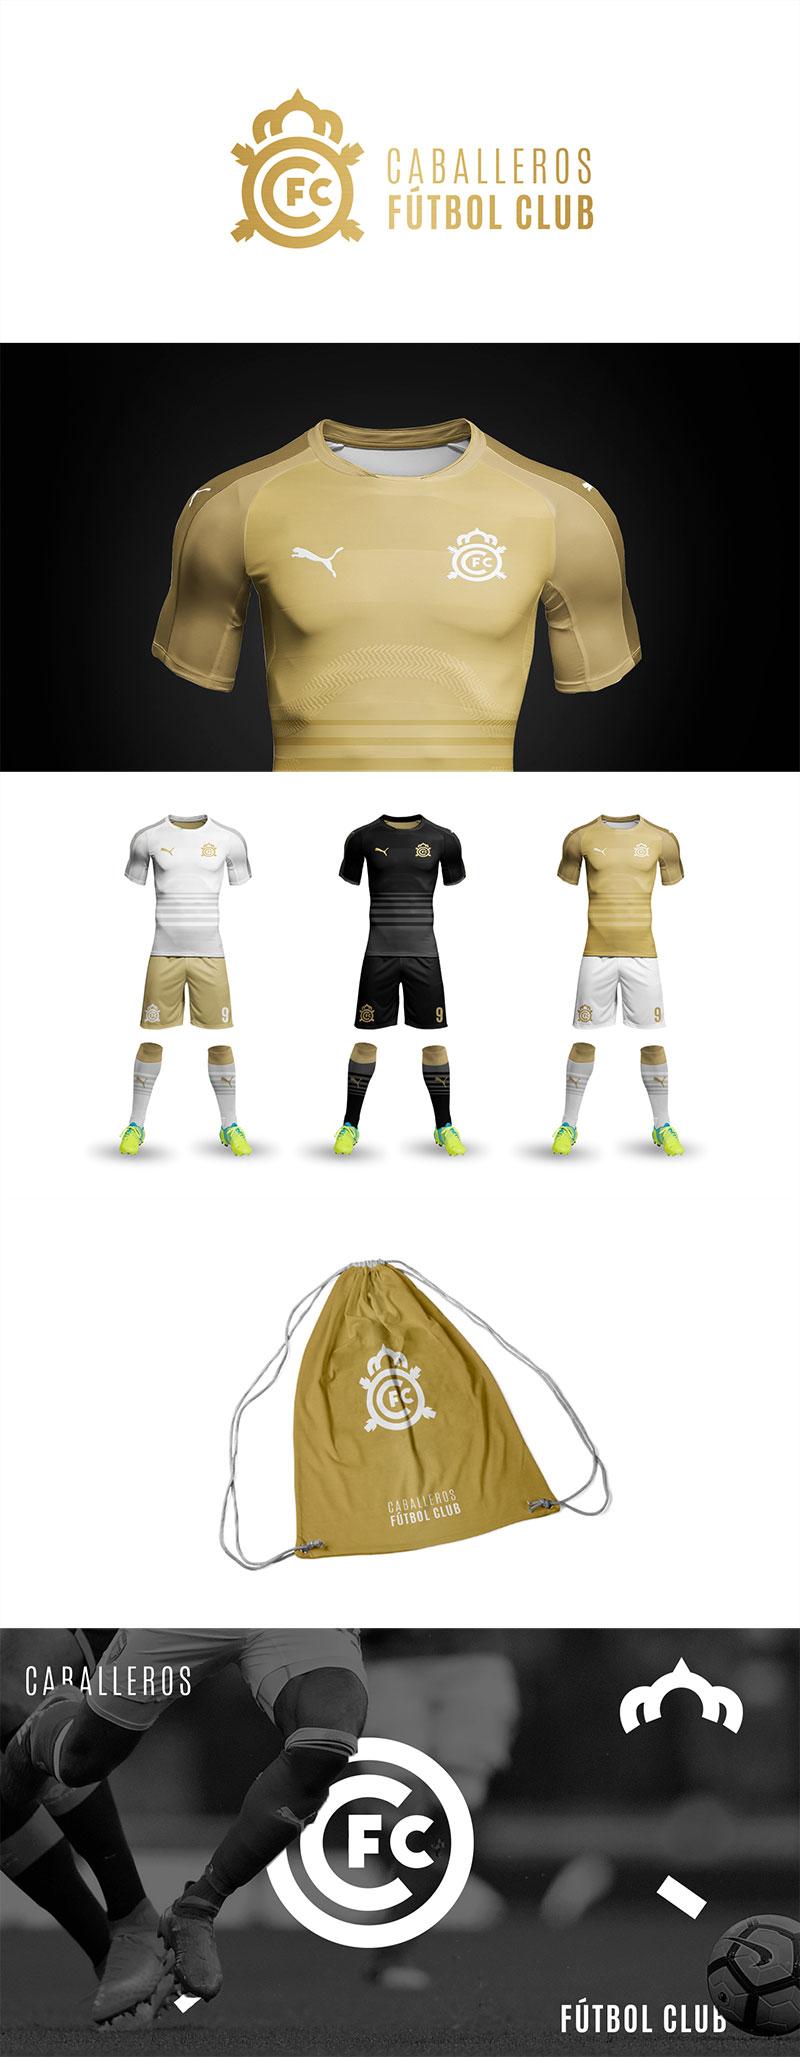 Caballeros Fútbol Club de Héctor Rodríguez